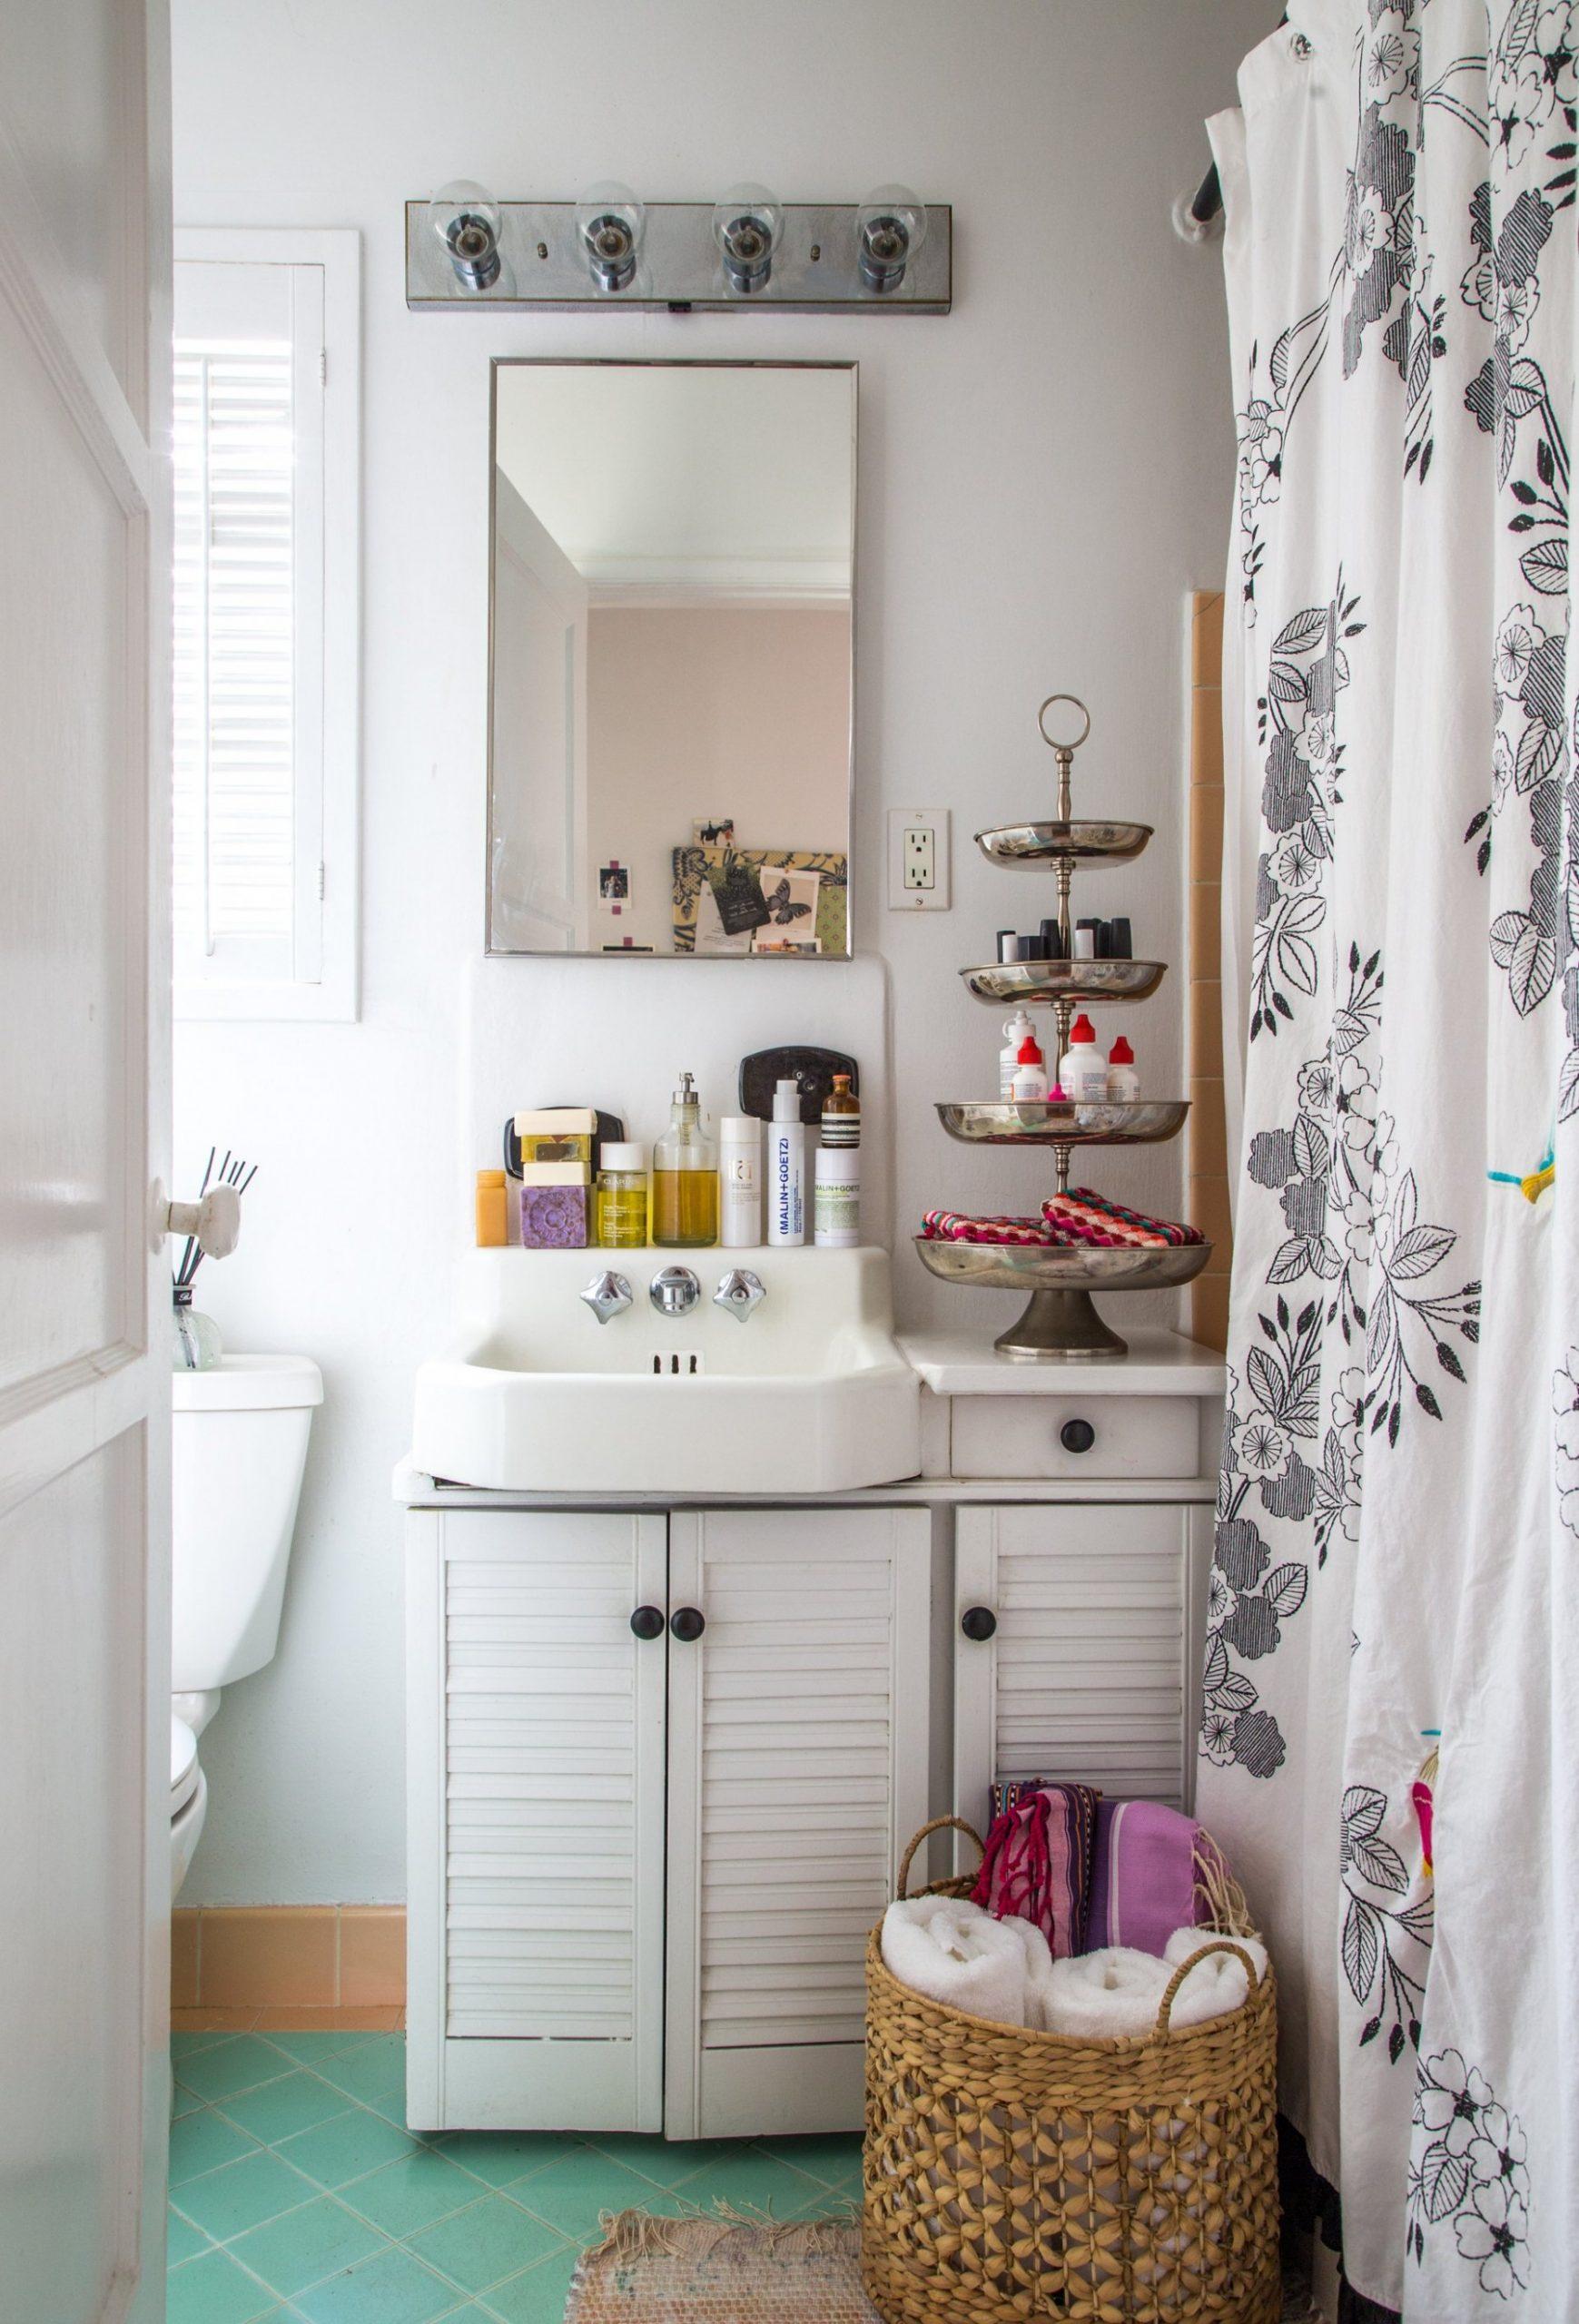 9 Best Small Bathroom Decorating Ideas - Tiny Bathroom Layout  - Bathroom Ideas Apartment Therapy